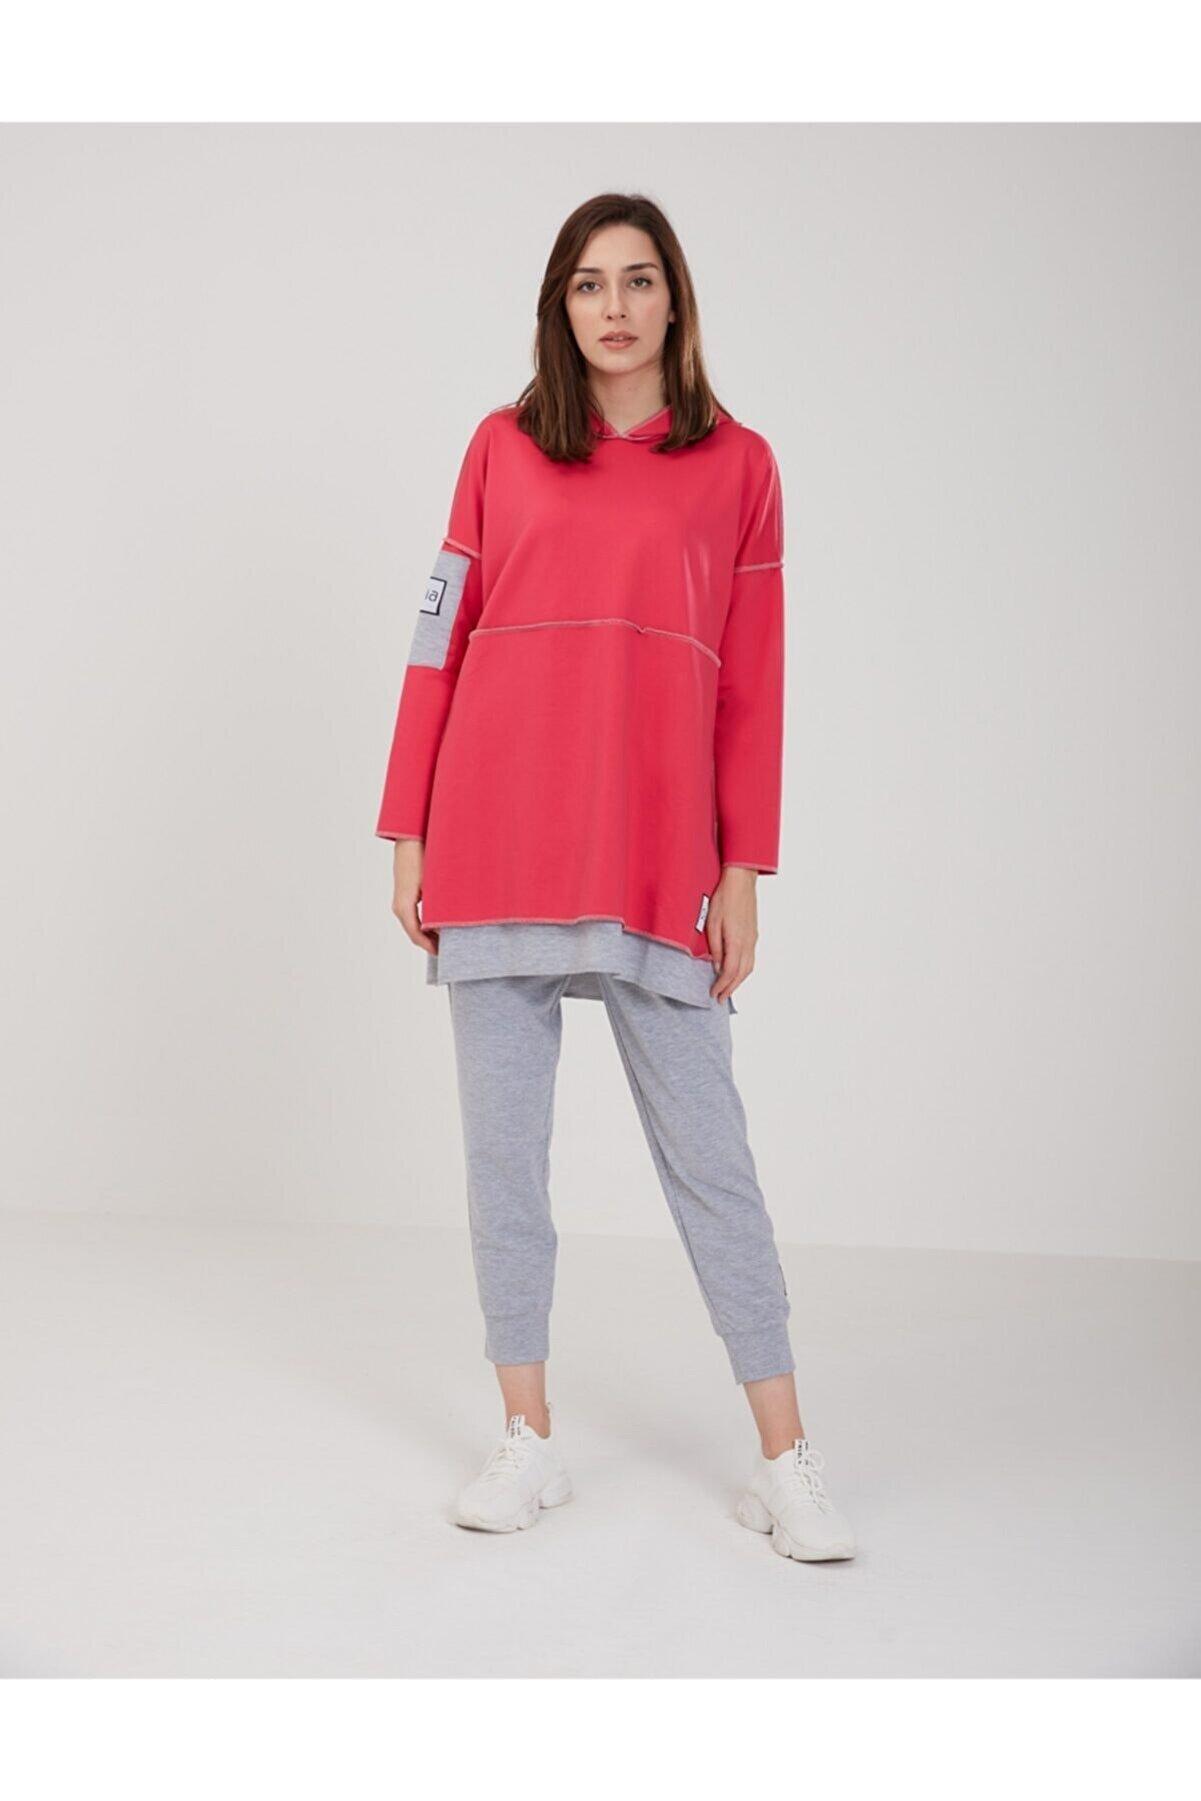 oia Kadın Fuşya Renk Pamuklu Tunik Pantolon Eşofman Takım W-0900